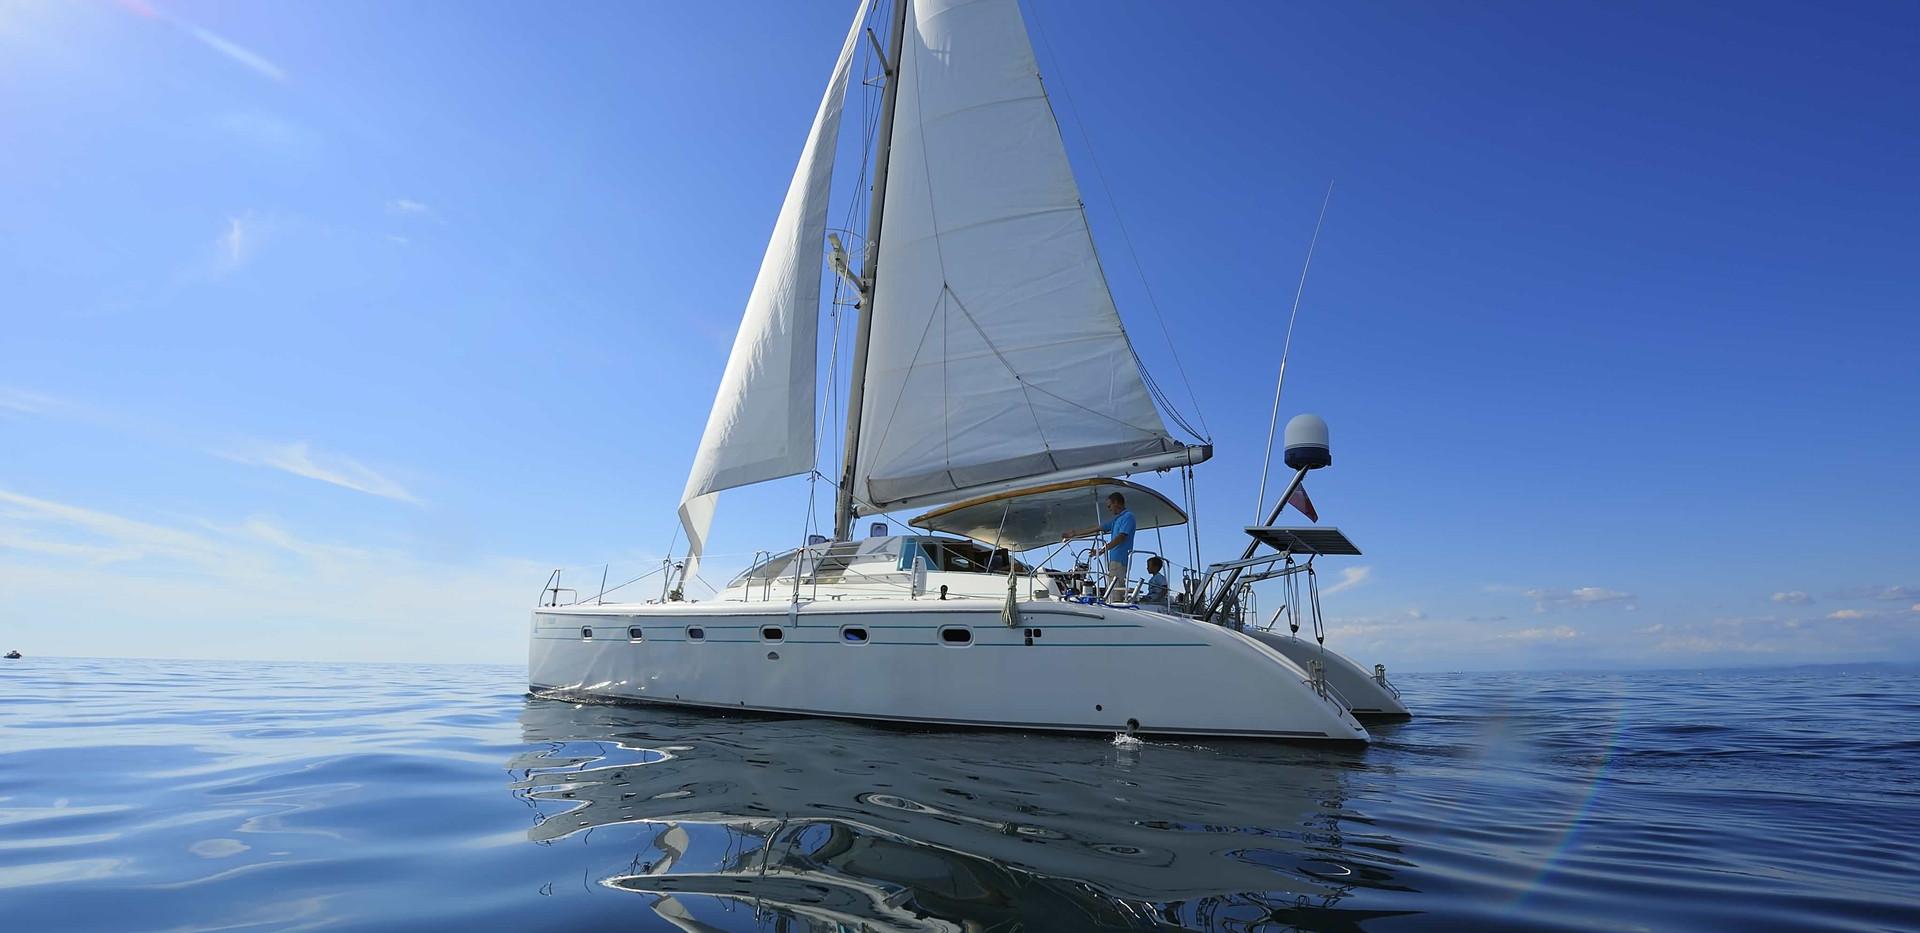 1. Sunset Catamaran Cruise 1.jpg